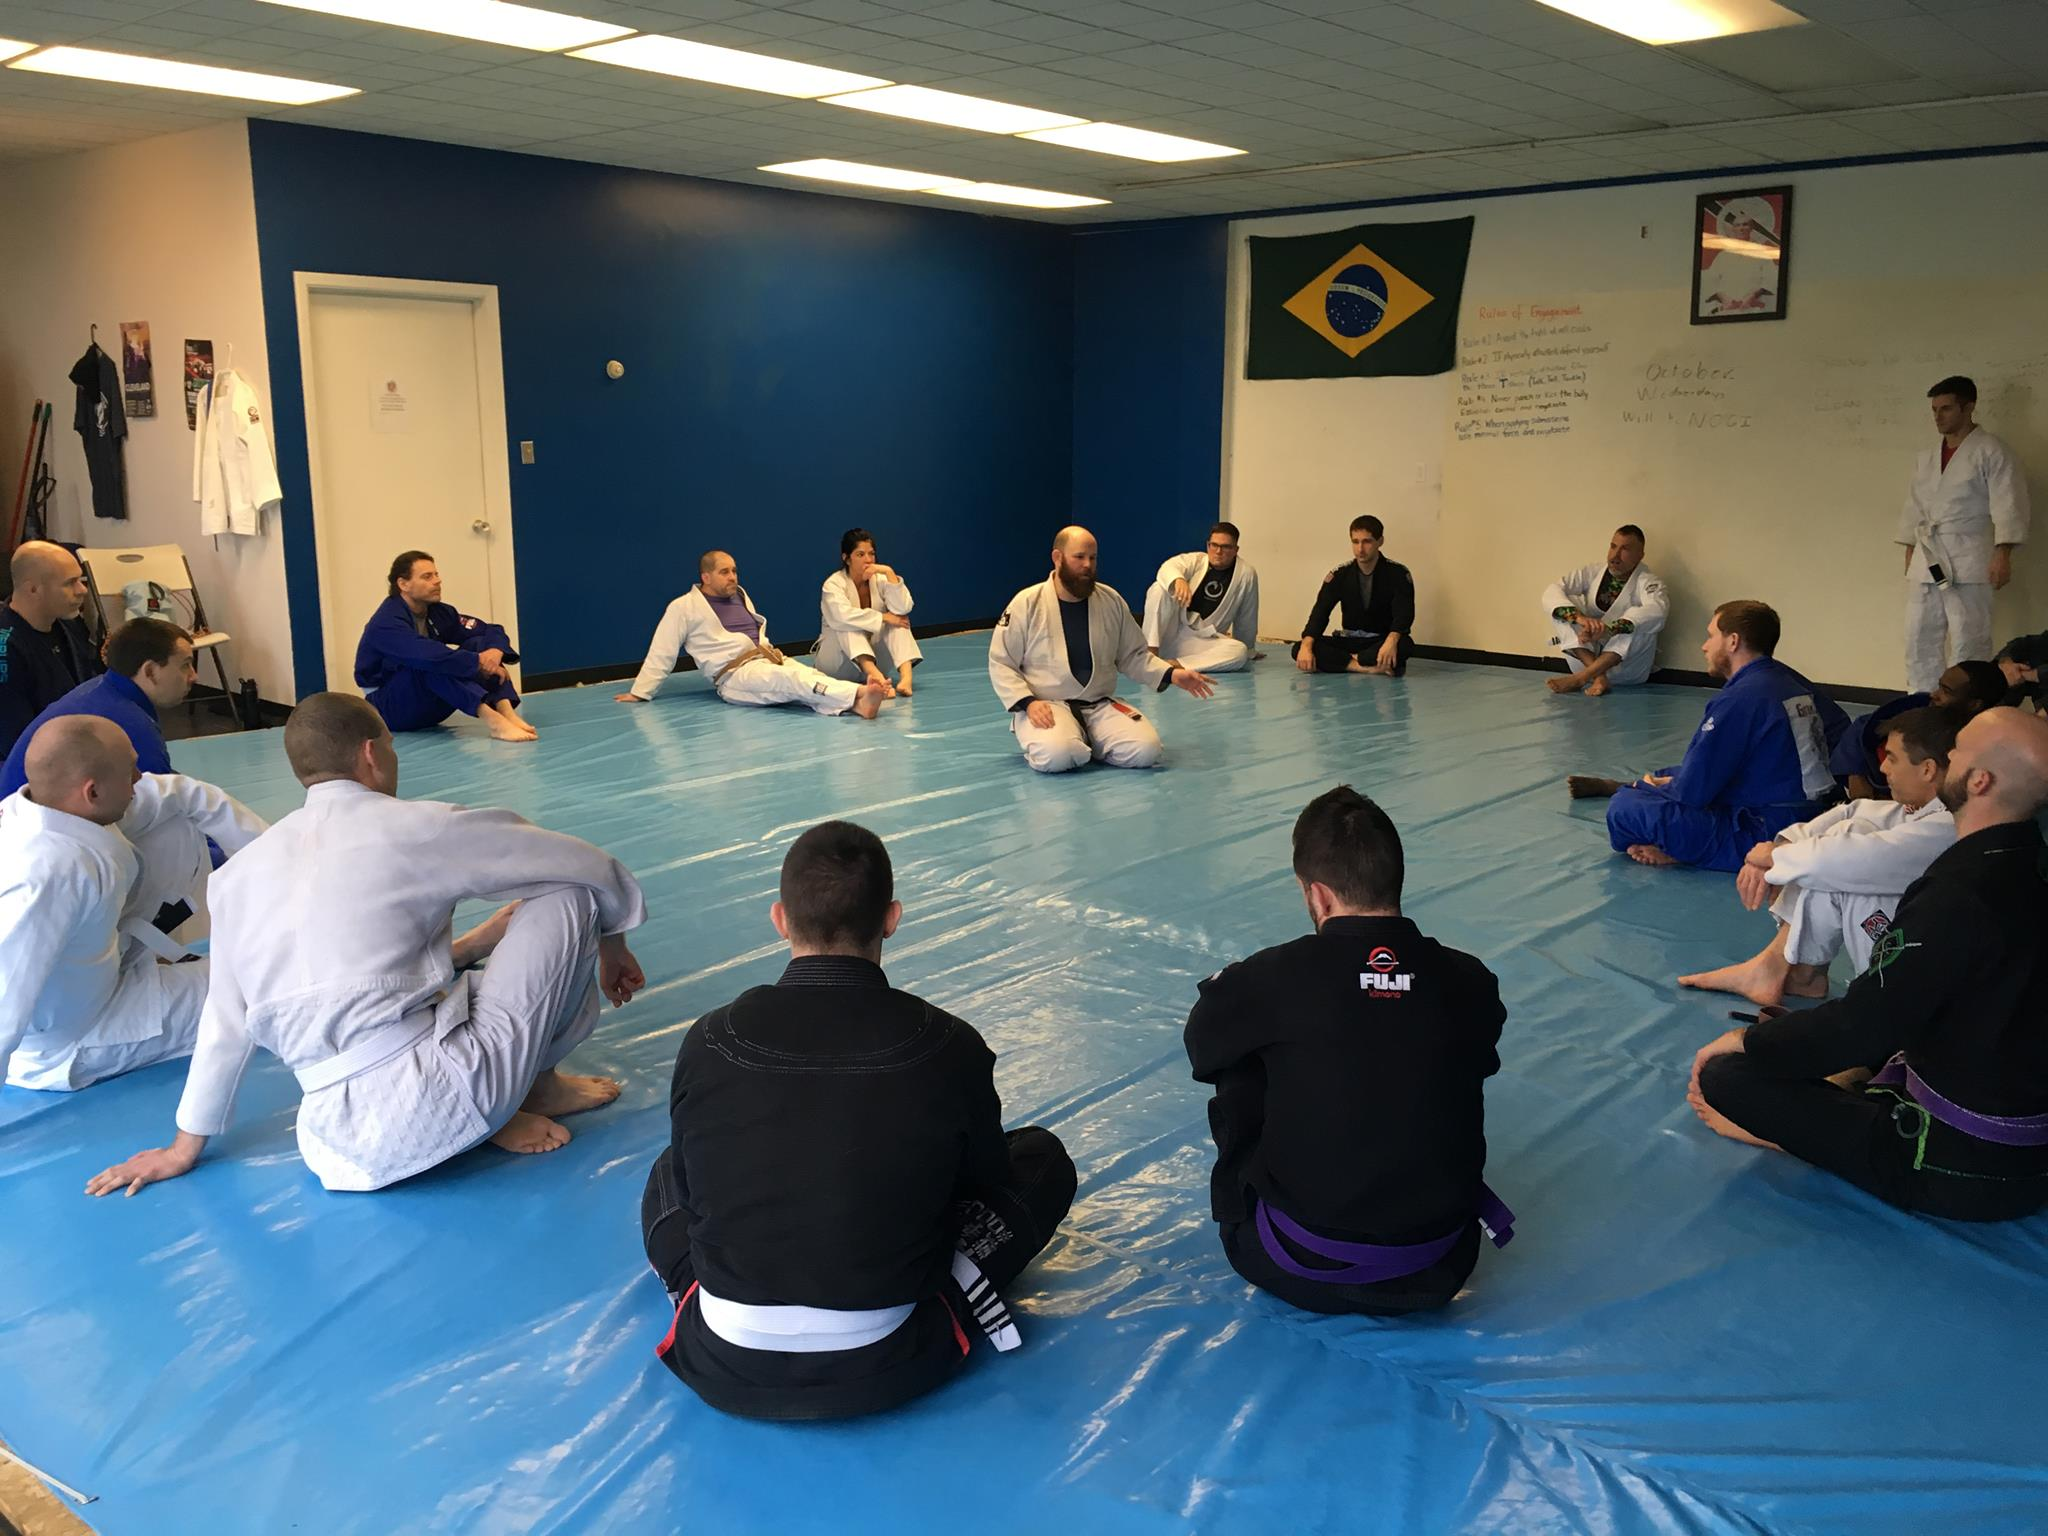 Dave Tabron Teaches Gracie Jiu-Jitsu